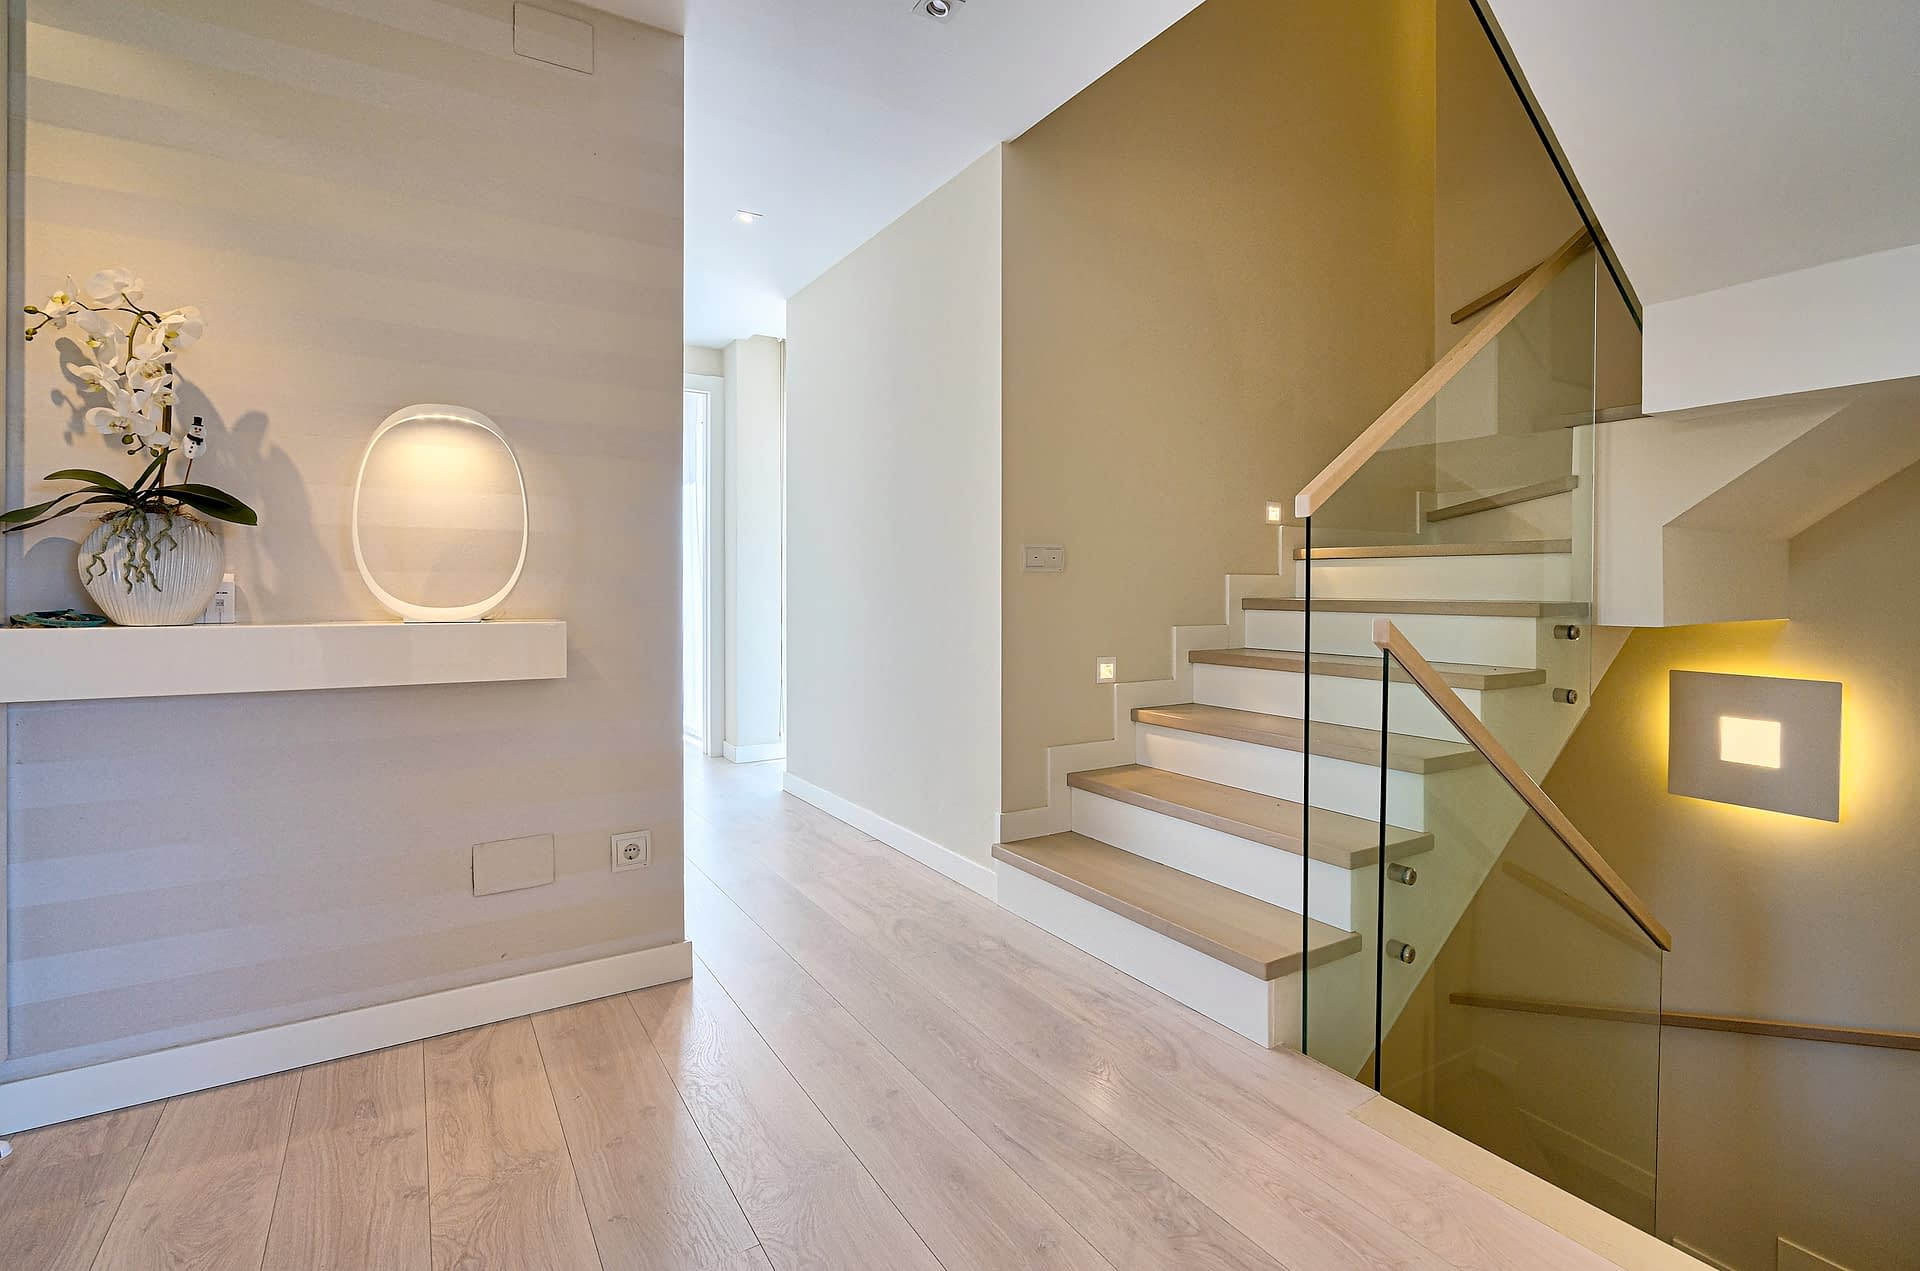 Pierluigi Cavarra - fotografo de Inmobiliaria - real estate photography costa blanca - ejemplo15